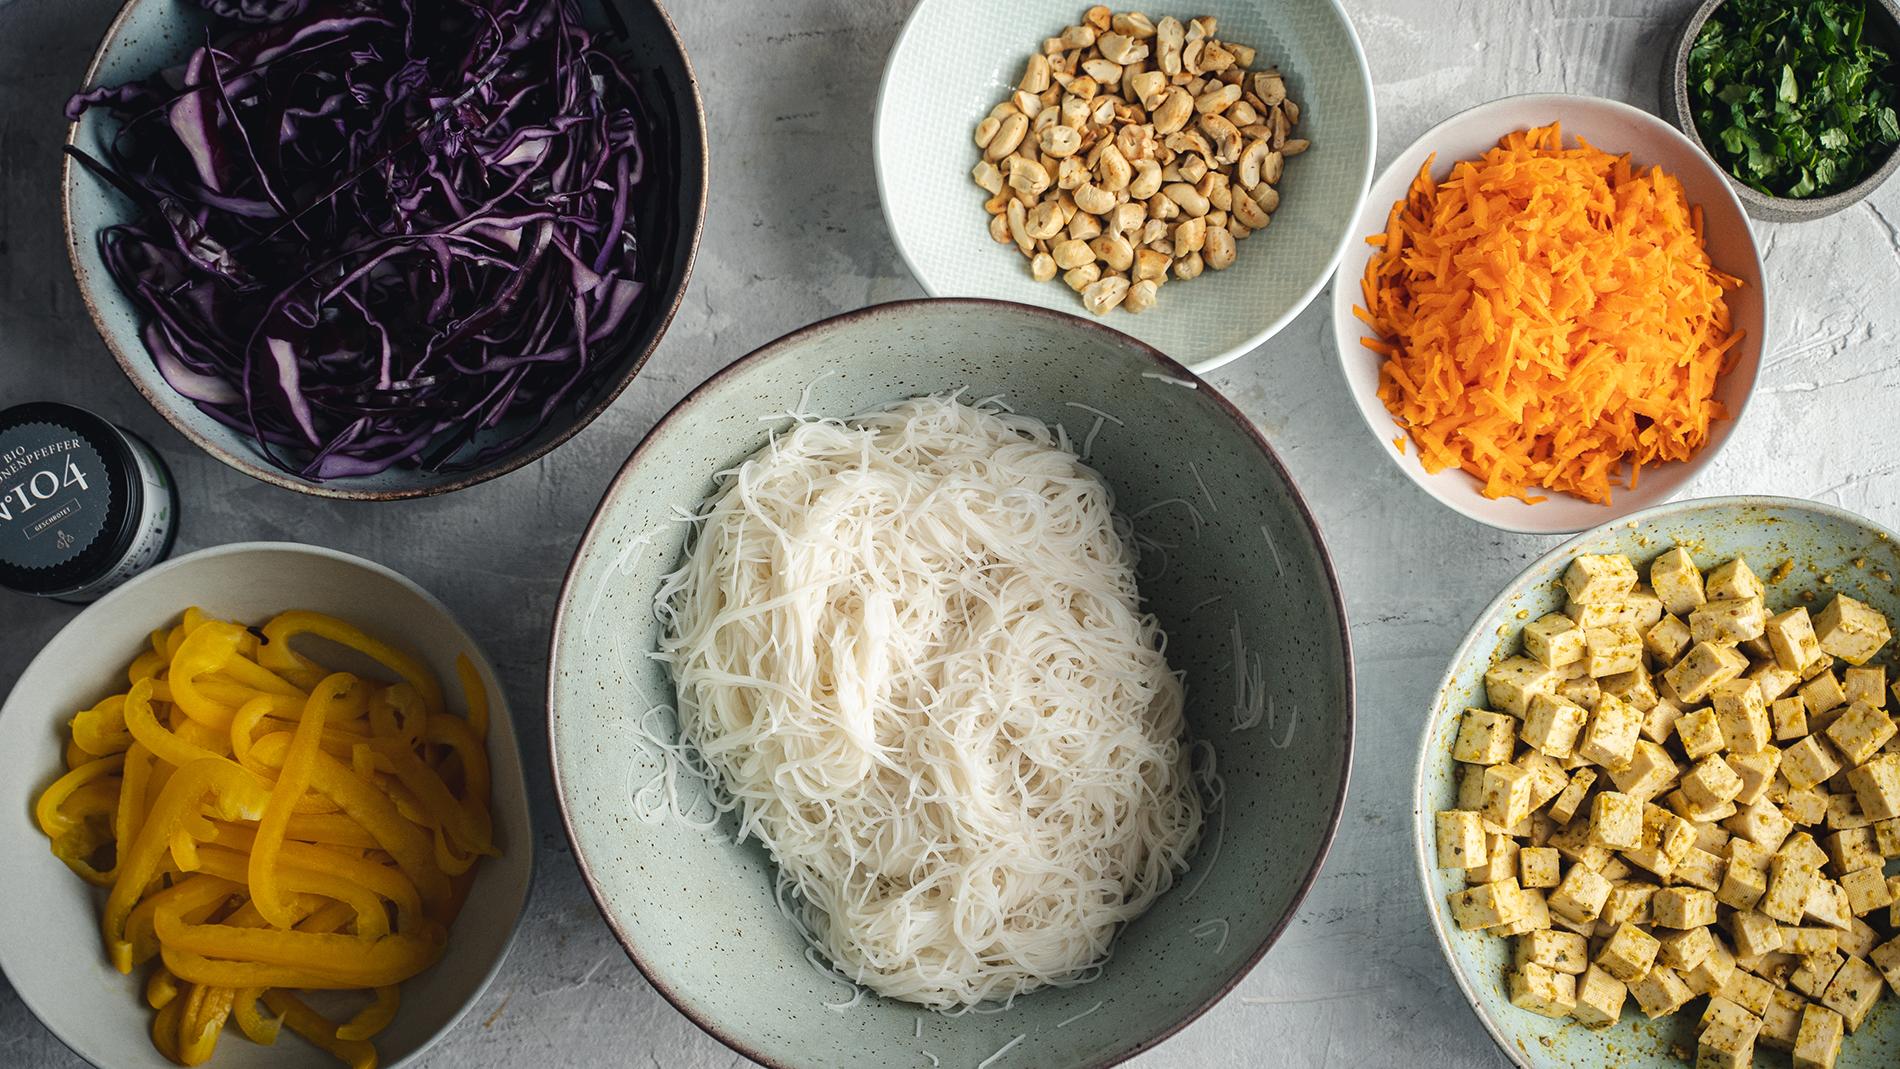 rimoco-zitronenpfeffer-rezept-marinierter-tofu-mit-reisnudeln-zutaten